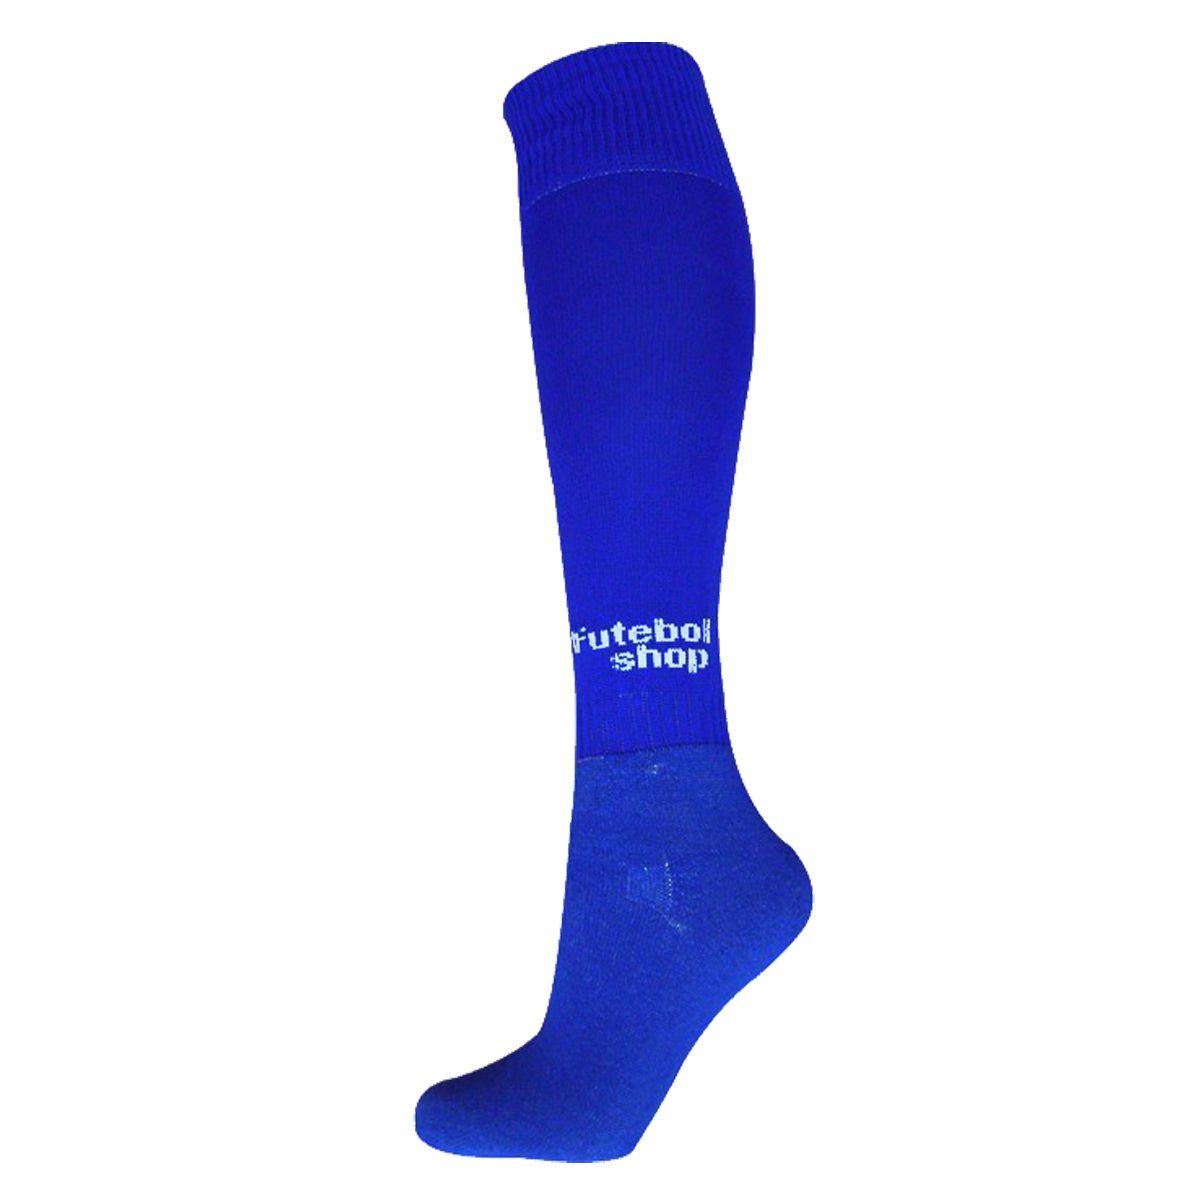 Kit C/ 12 Pares Meião Futebol Adulto (Preto + Azul) - 39/44